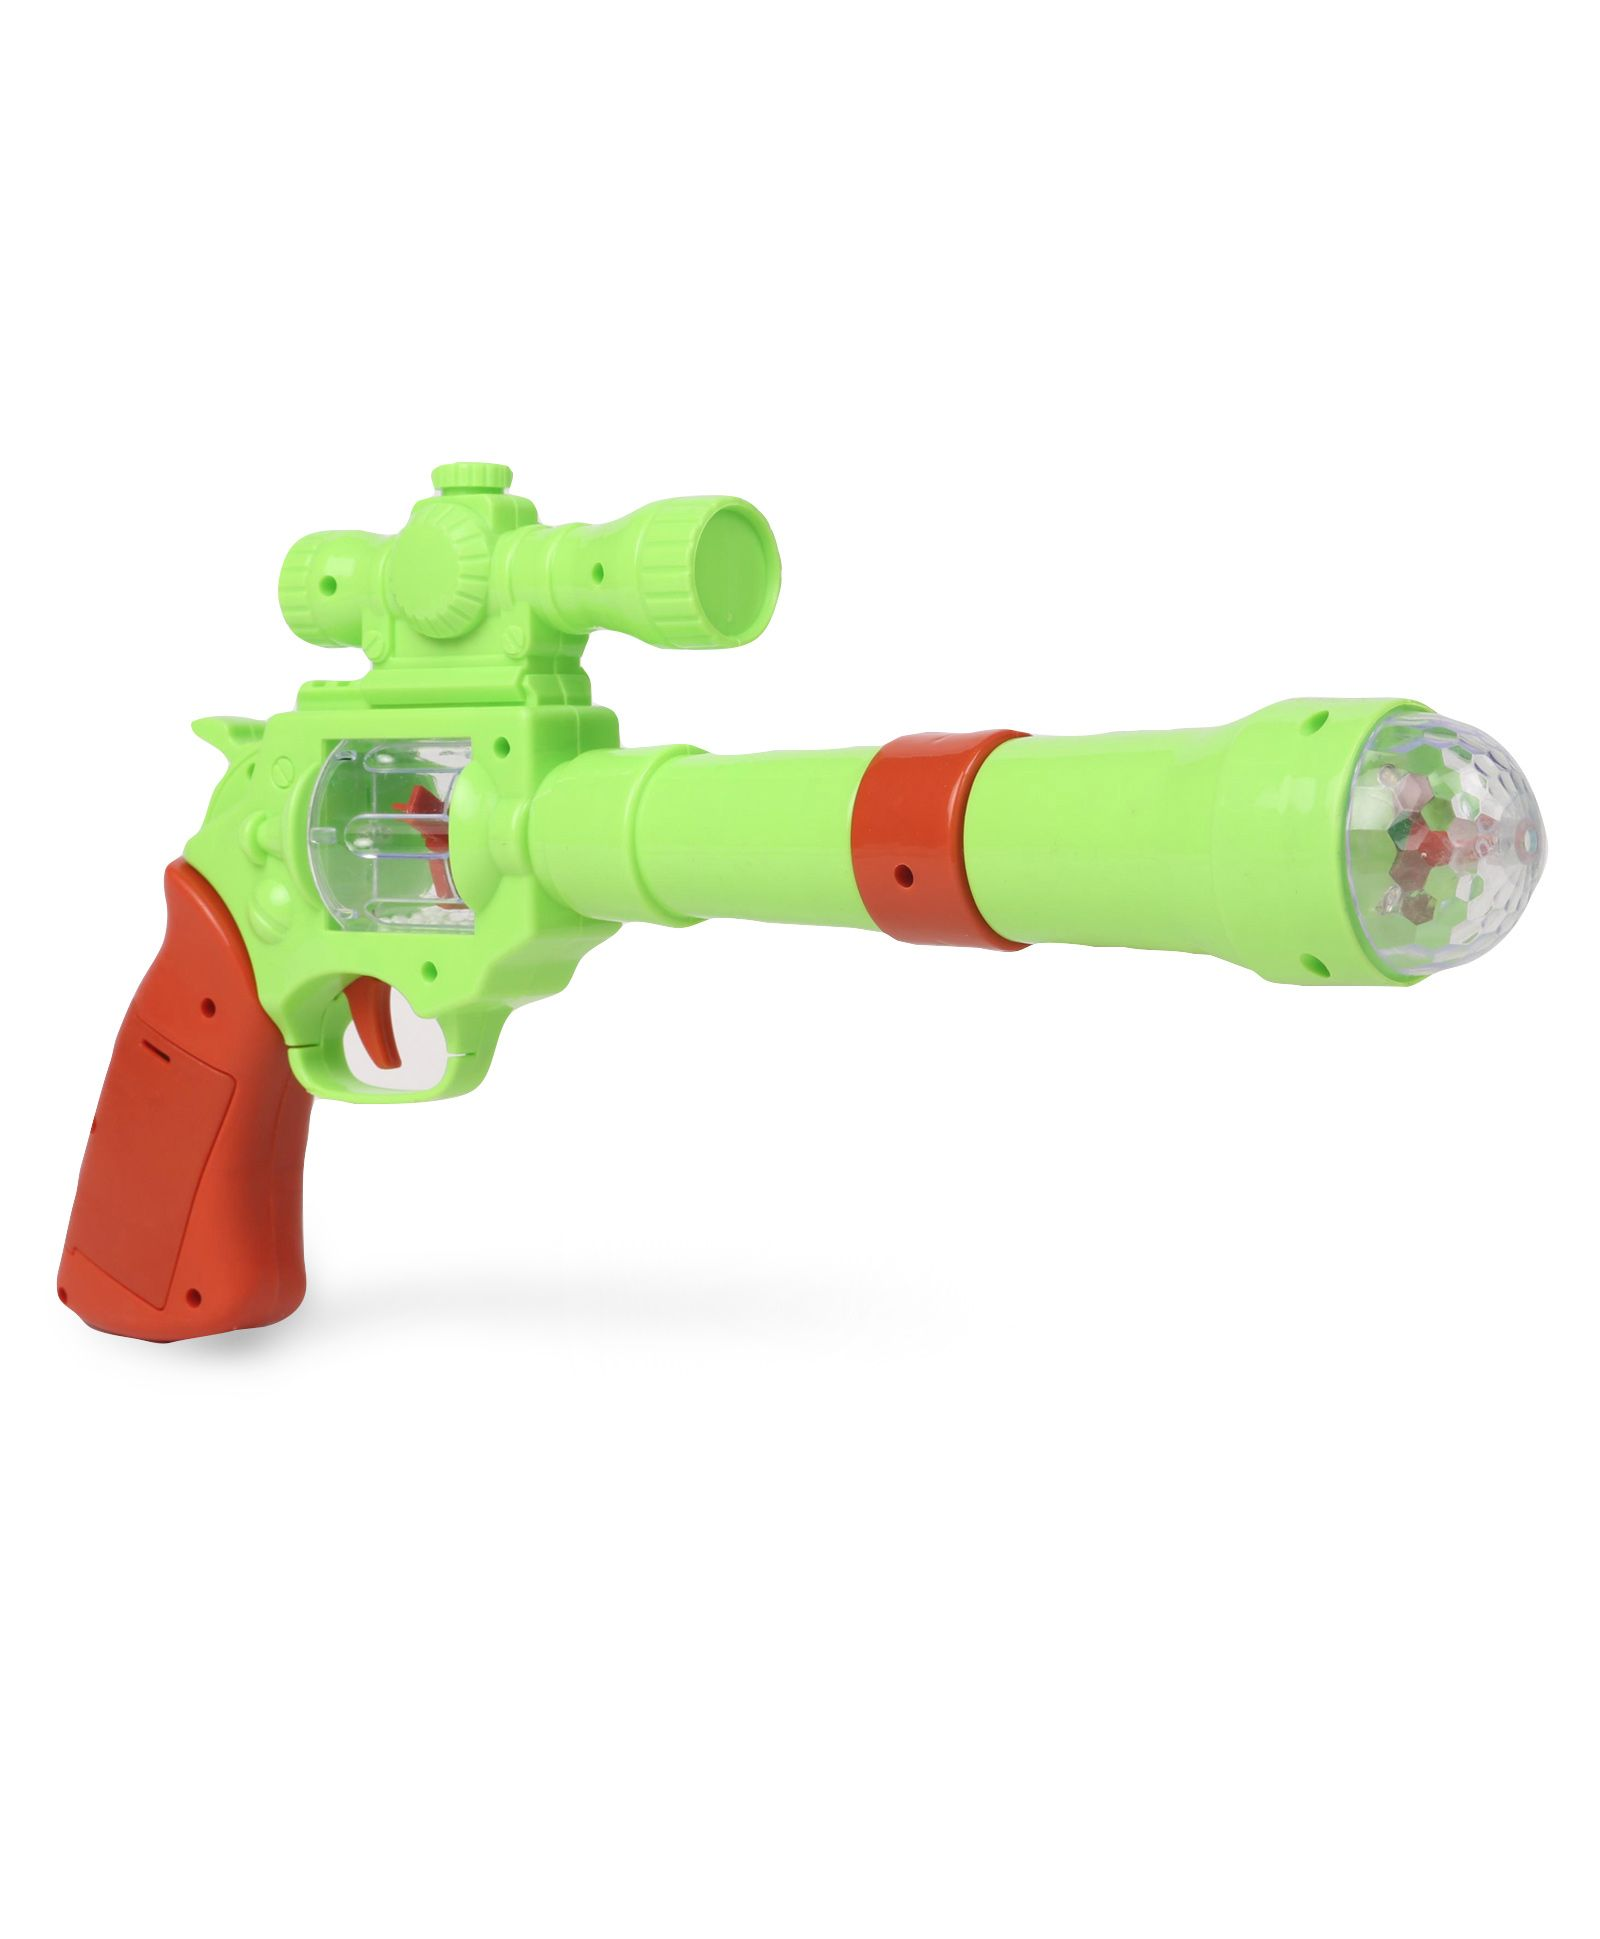 Playmate Pirate Gun With Light And Sound - Green Dark Orange